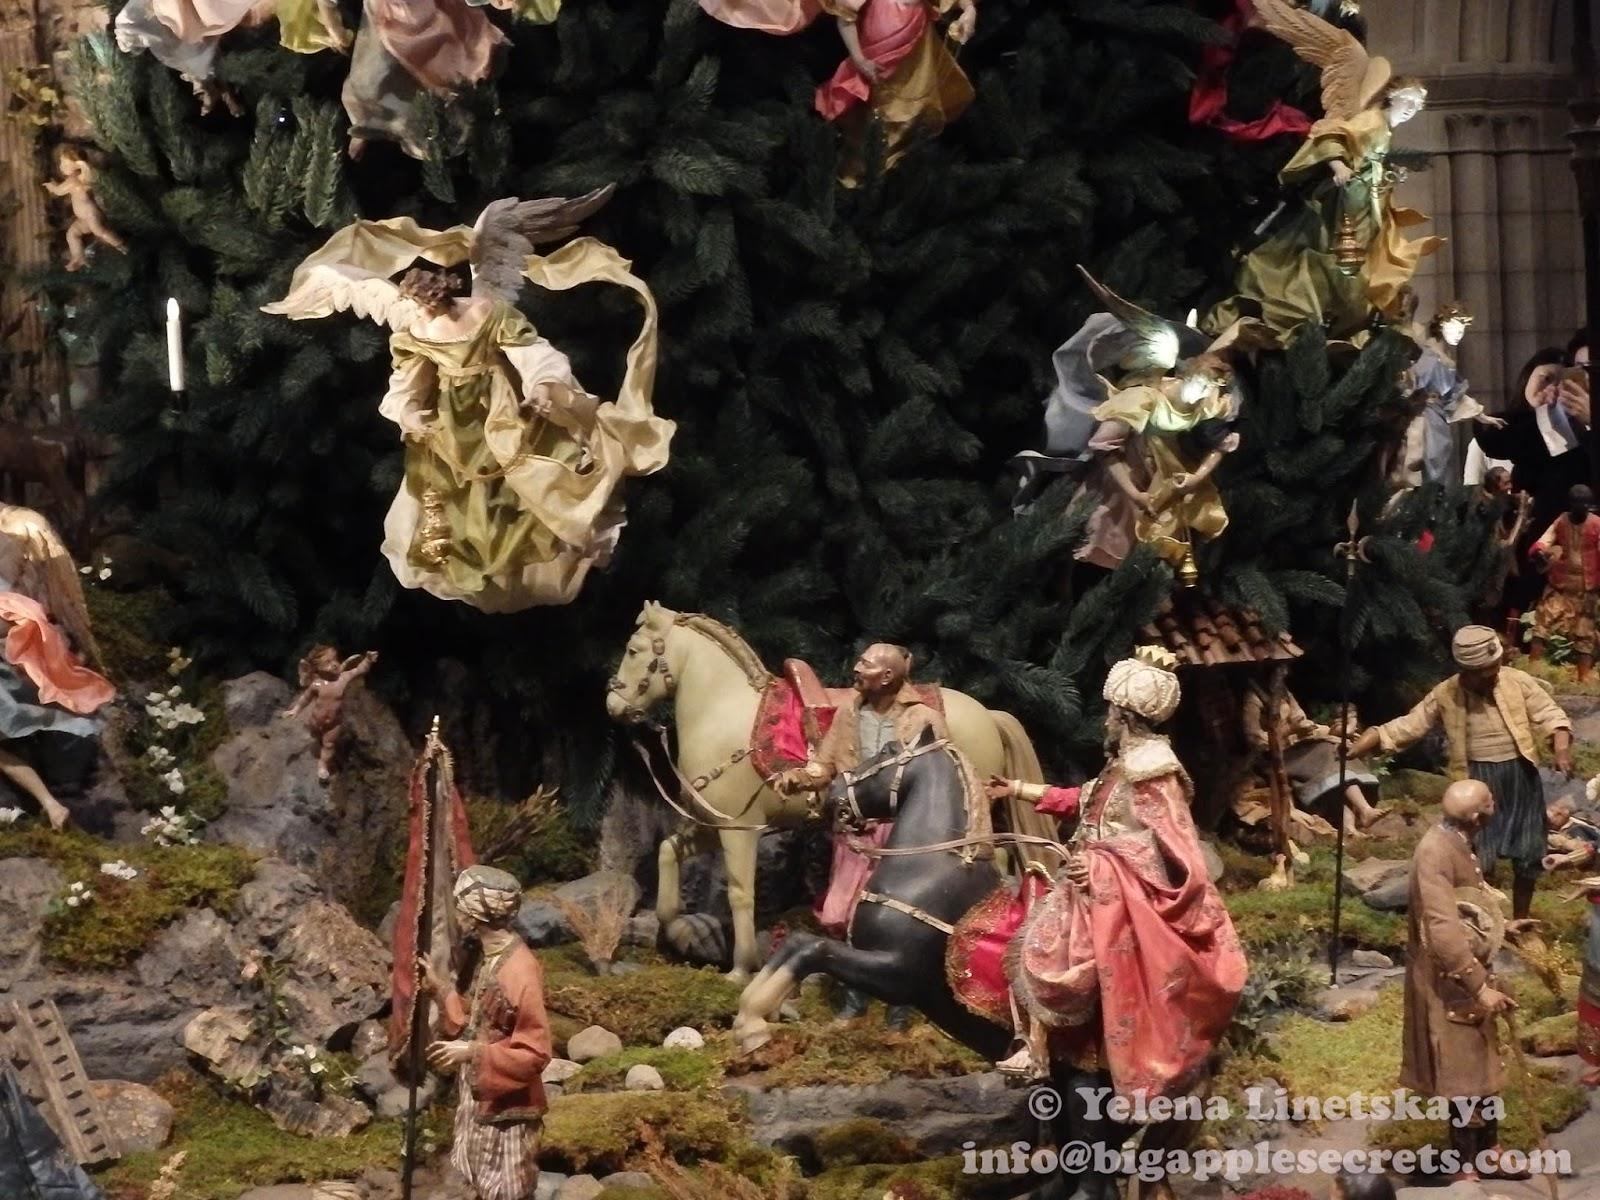 Big Apple Secrets: Metropolitan Museum Of Art's' Christmas